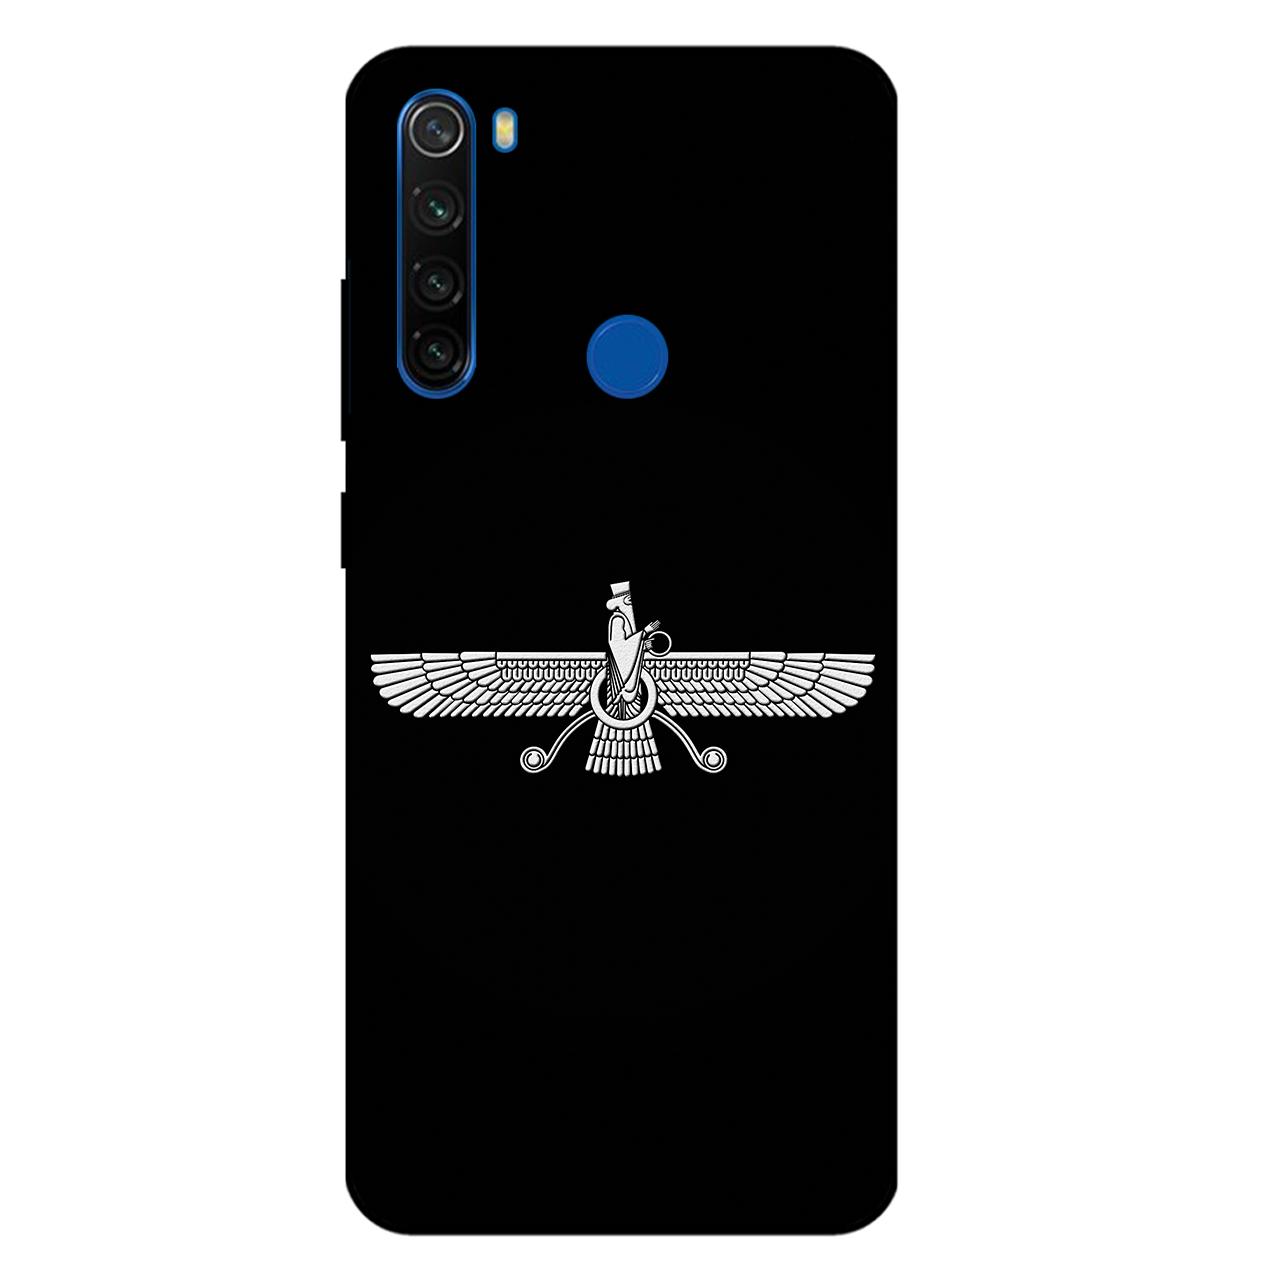 کاور کی اچ کد 7206 مناسب برای گوشی موبایل شیائومی Redmi Note 8T 2019 thumb 2 1